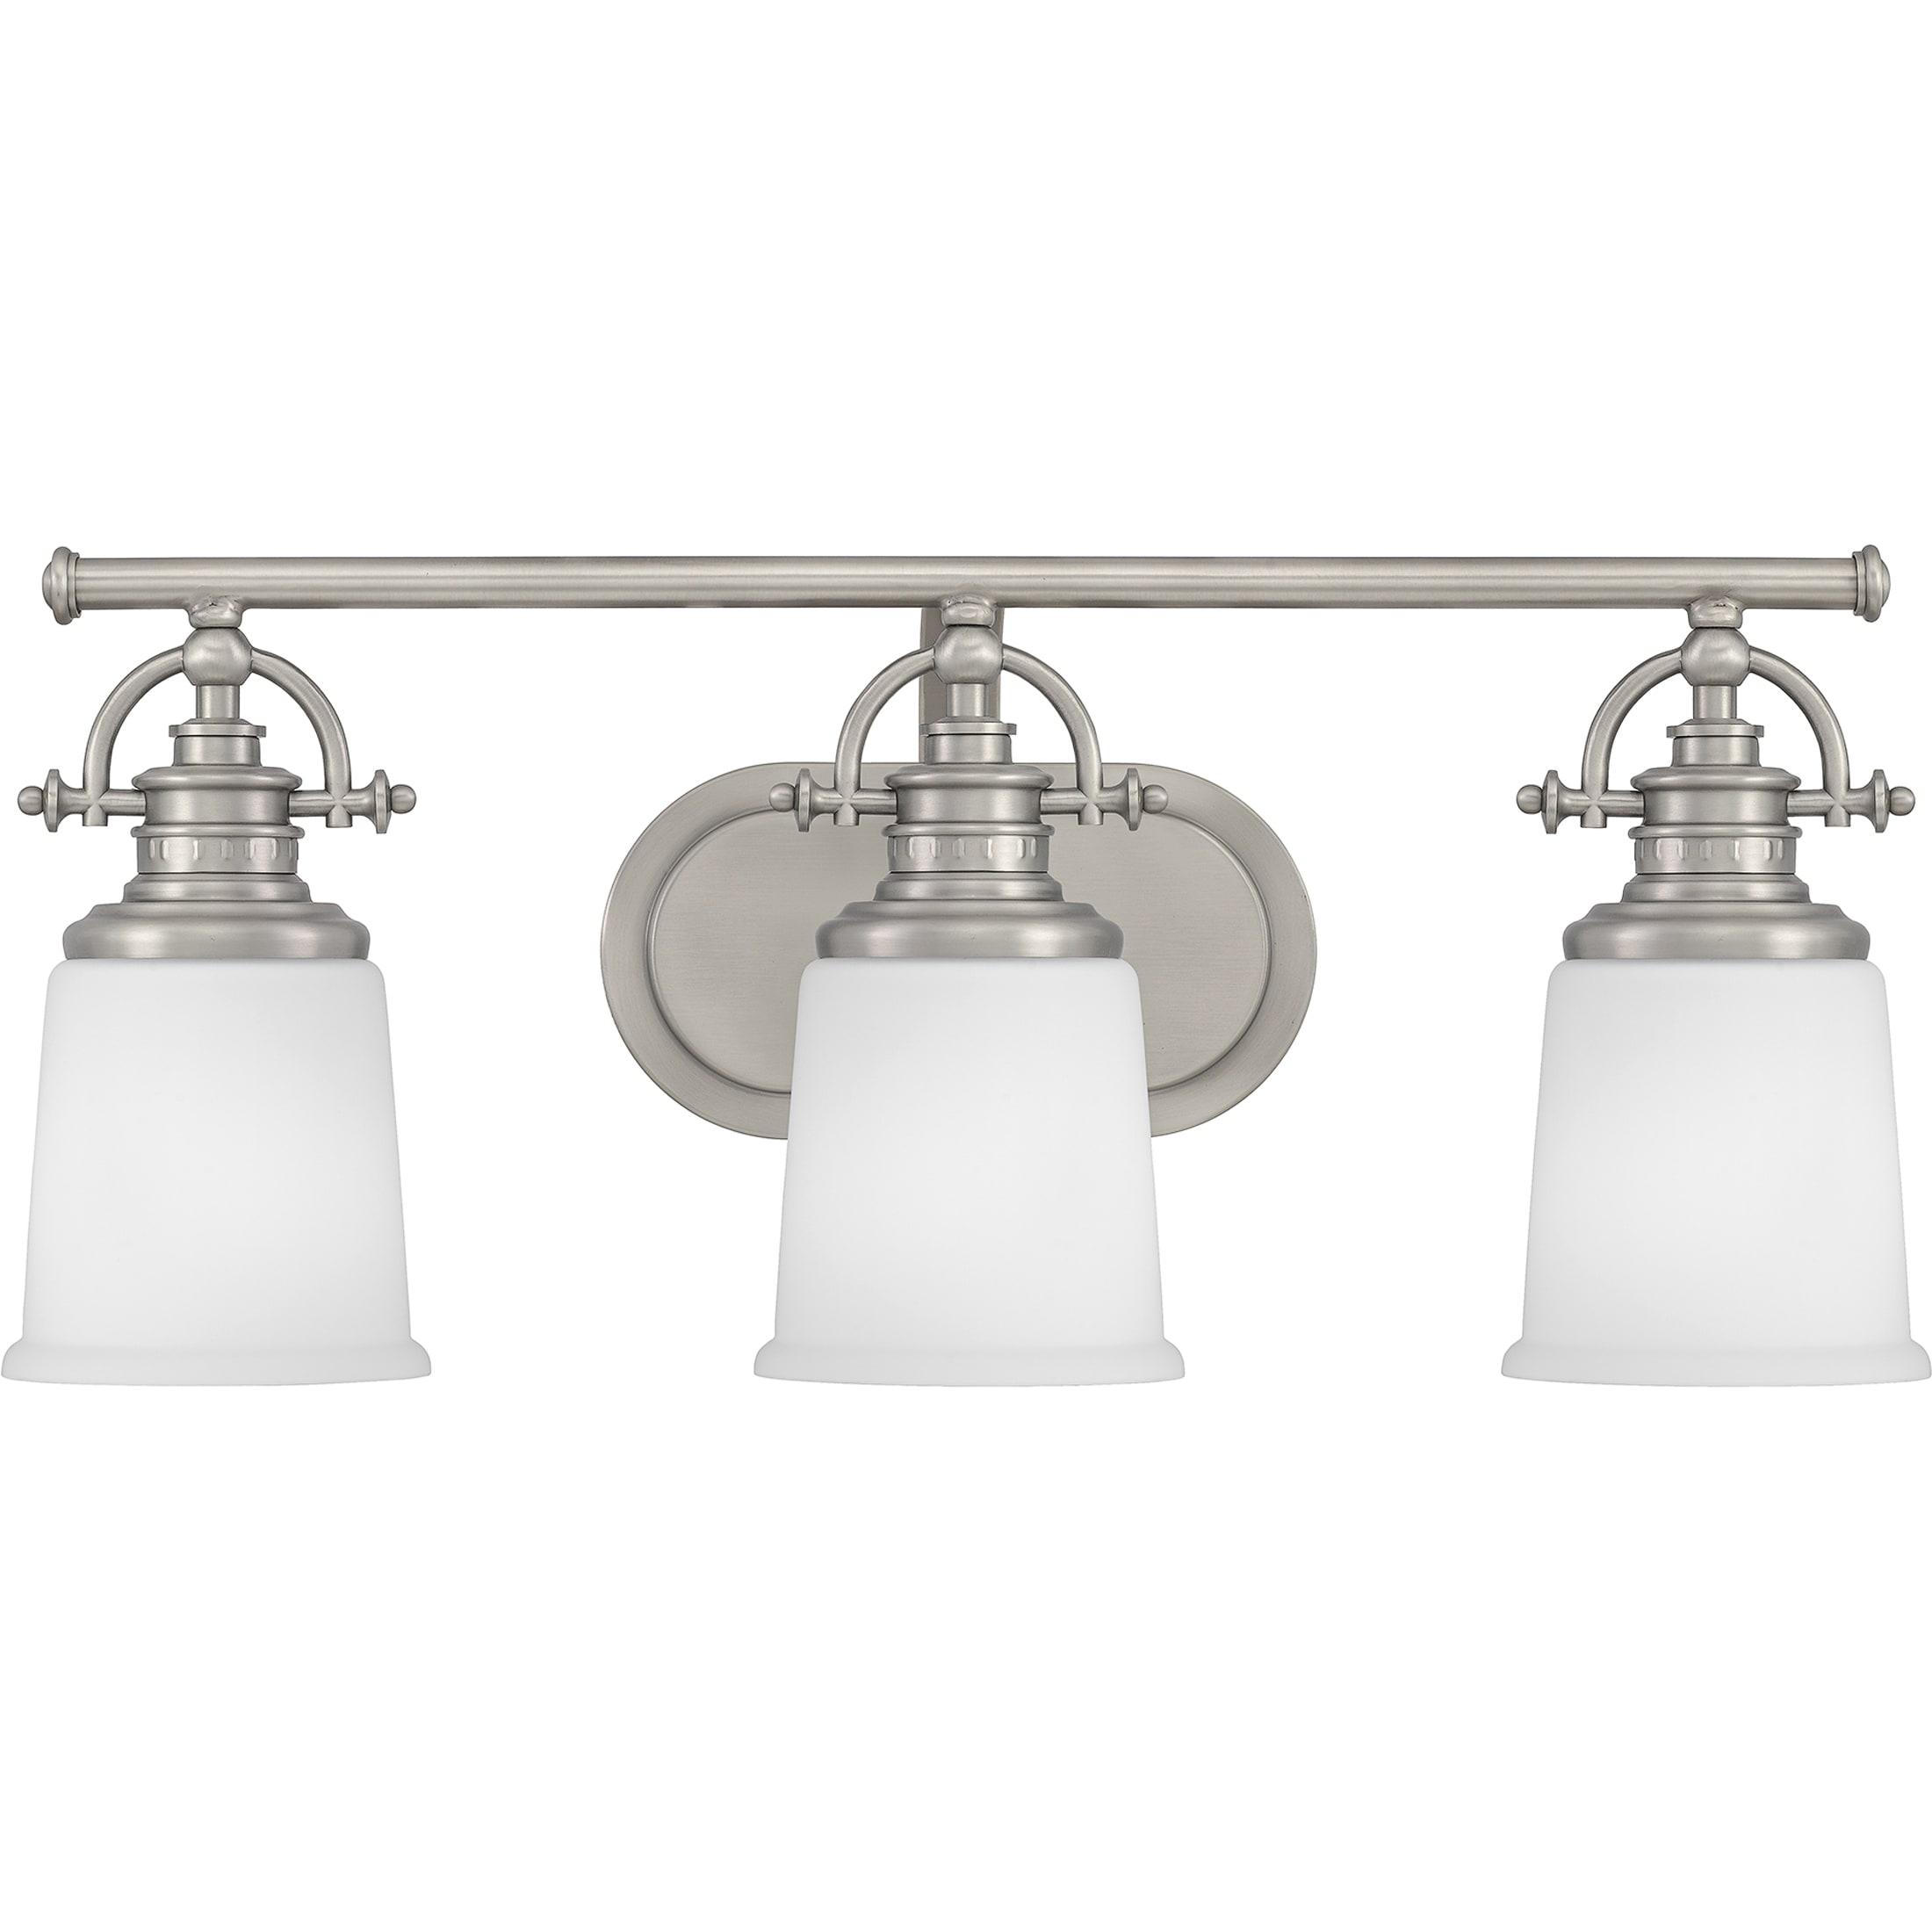 Quoizel Grt8603c Polished Chrome Grant 3 Light 23 Wide Bathroom Vanity Light Lightingdirect Com